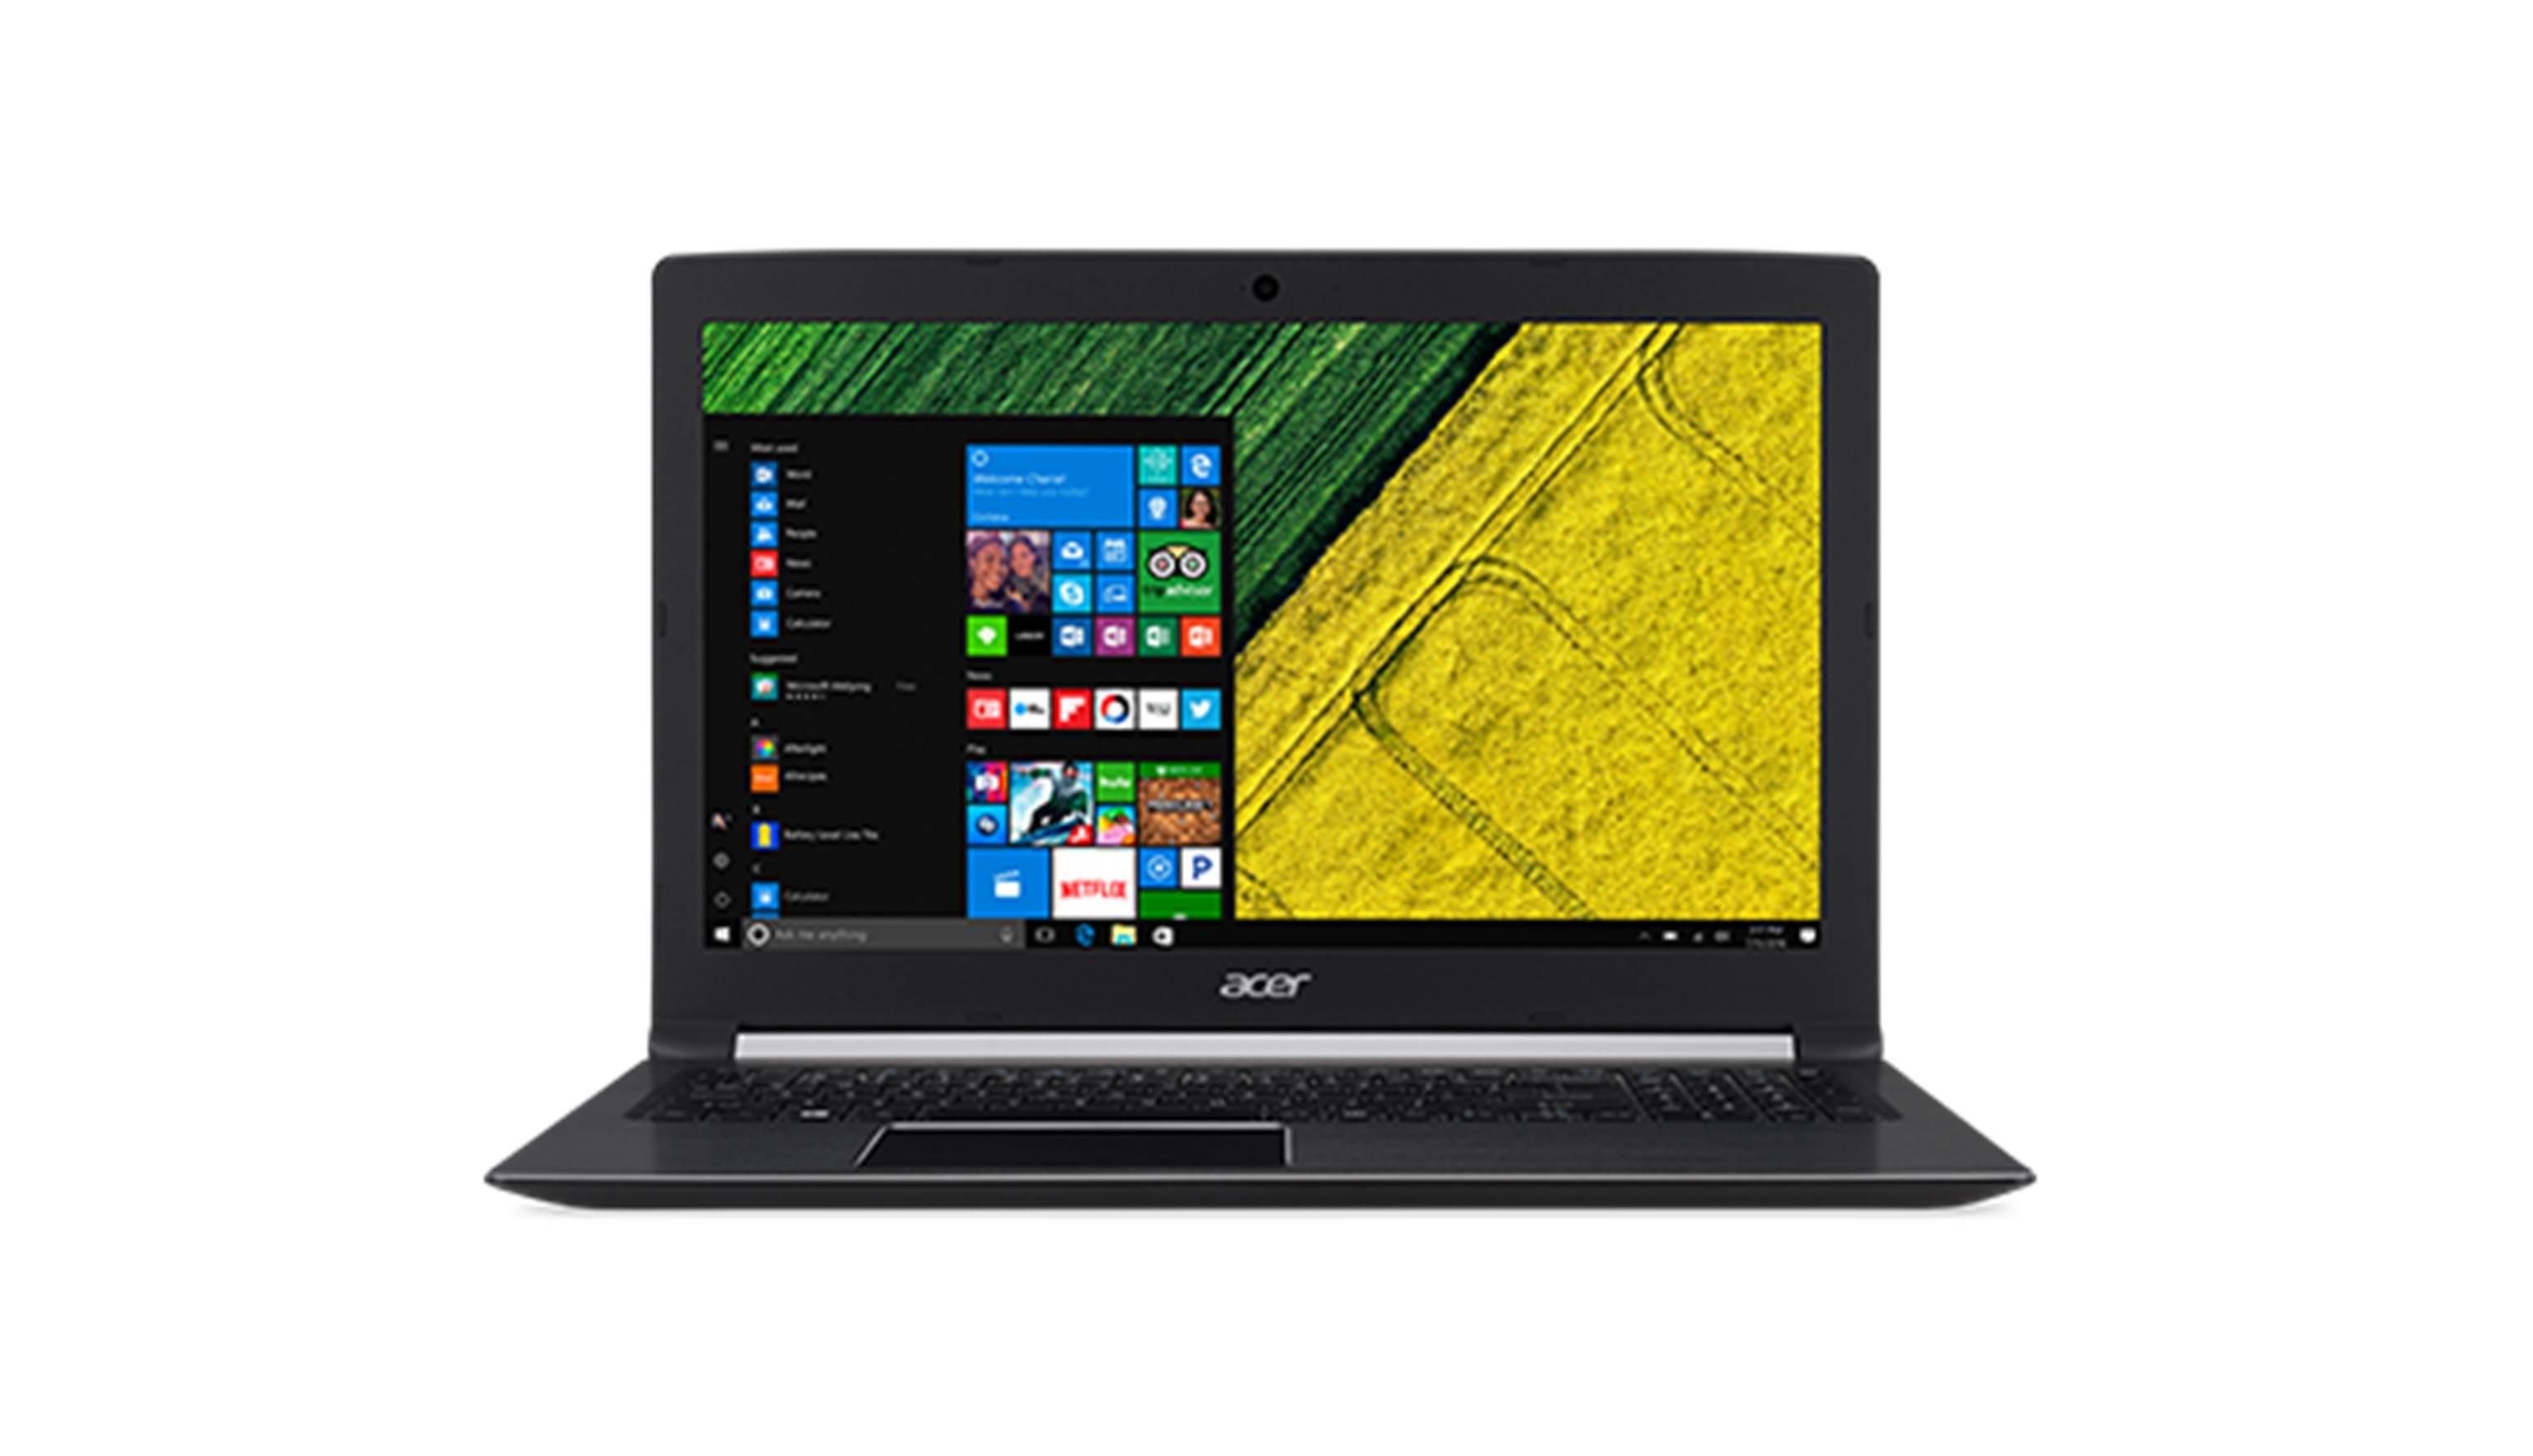 Acer Aspire 5 A515-41G-F0LJ 15.6 Laptop